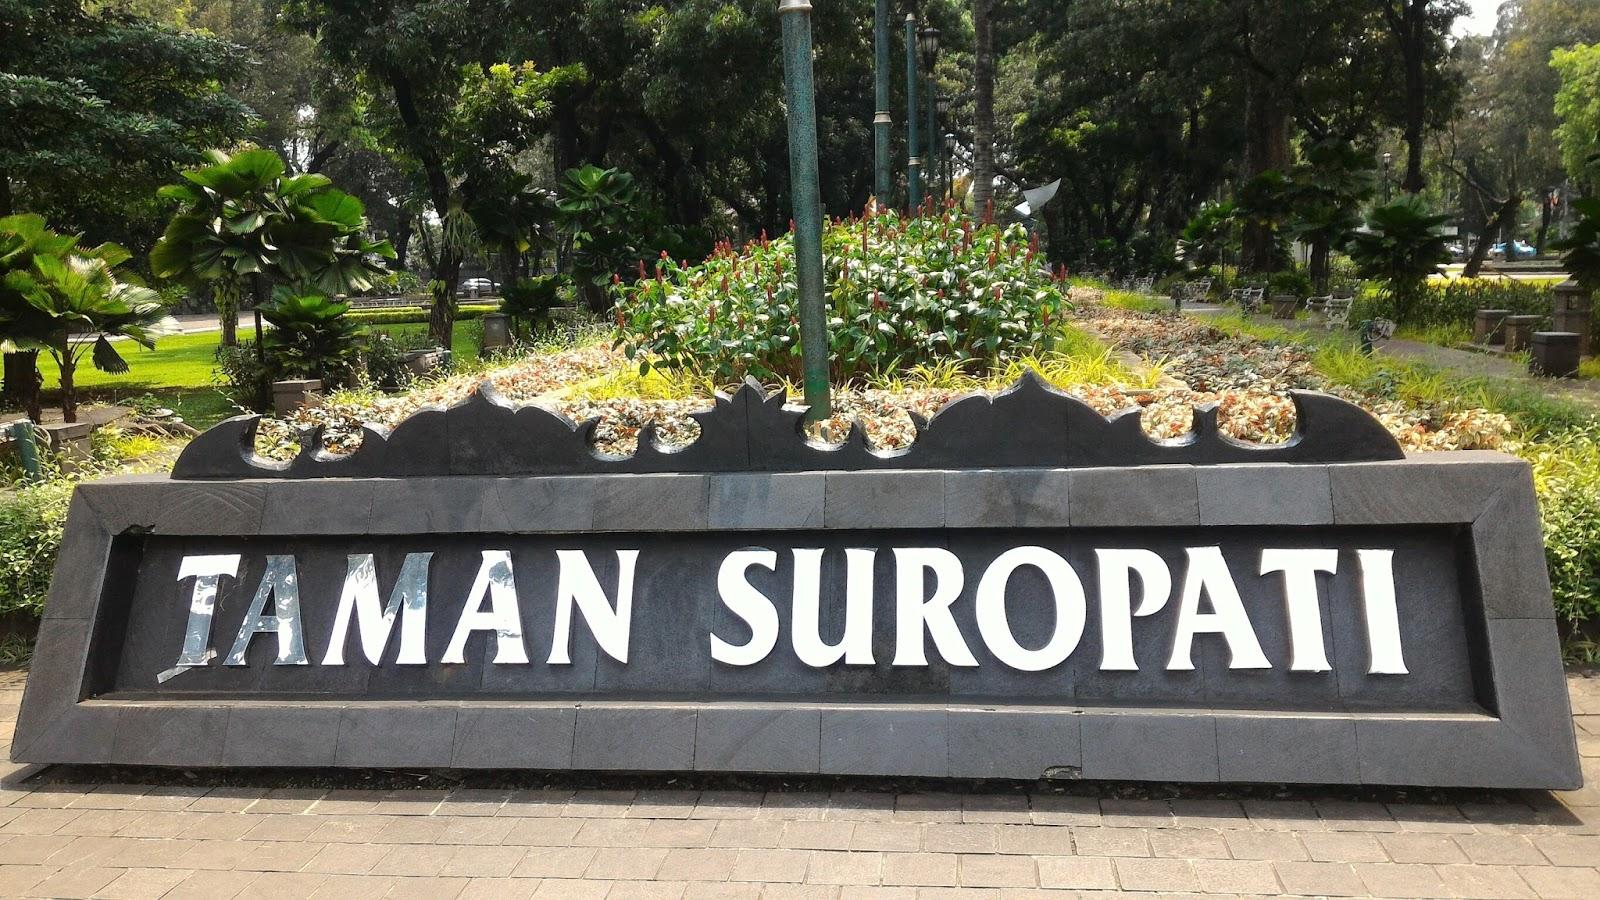 Muhammad Rizky Minardi Taman Suropati Teletak Jalan Diponegoro Jakarta Pusat